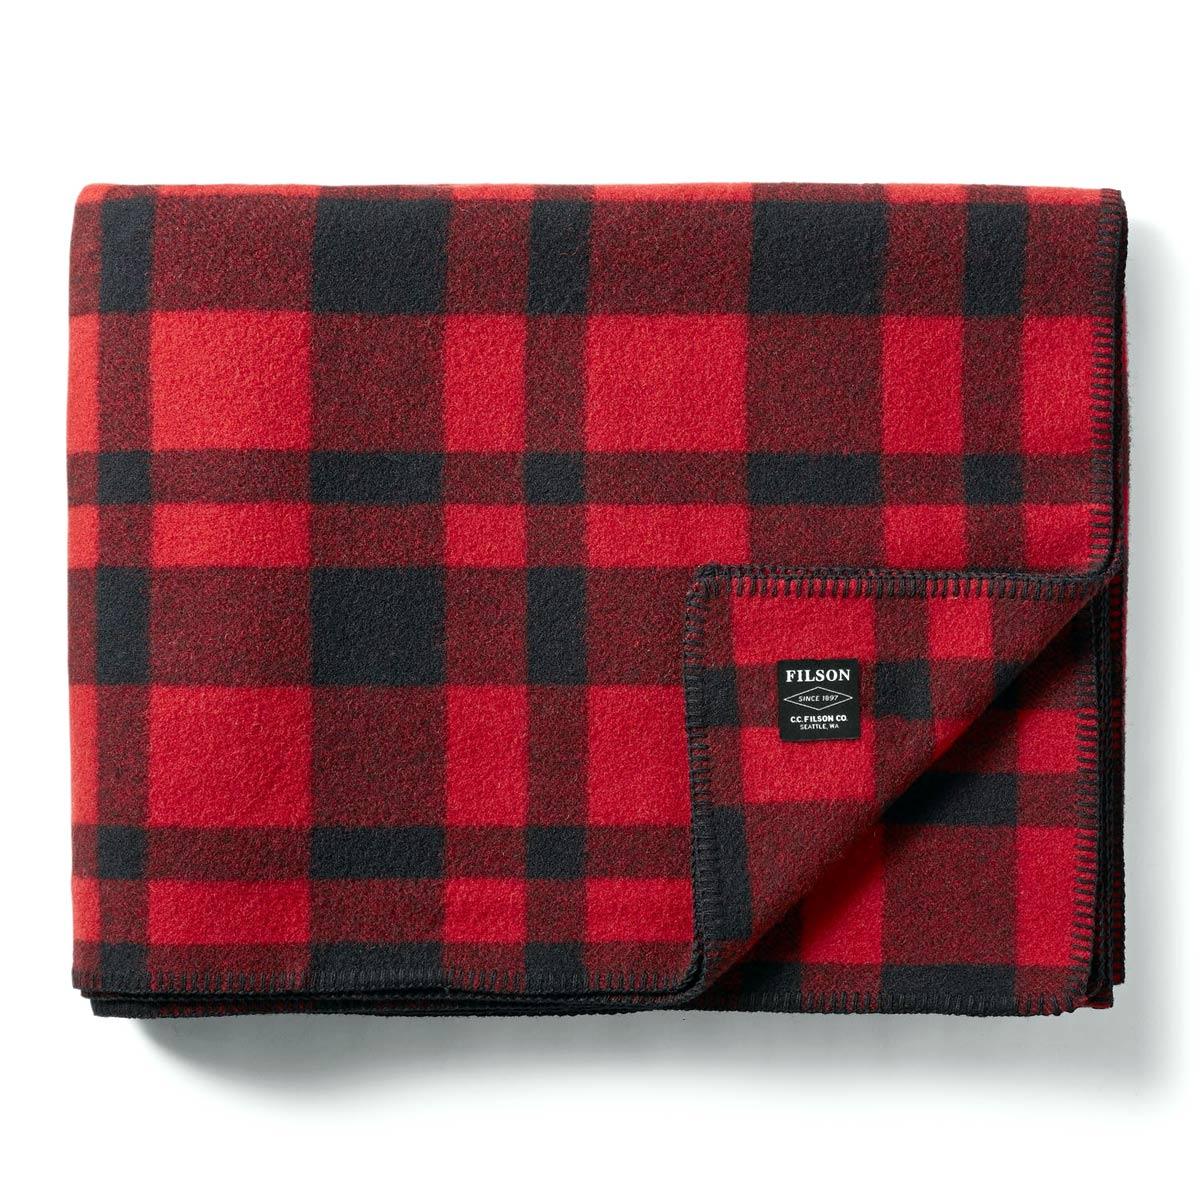 Filson Mackinaw Wool Blanket 11080110-Red Black